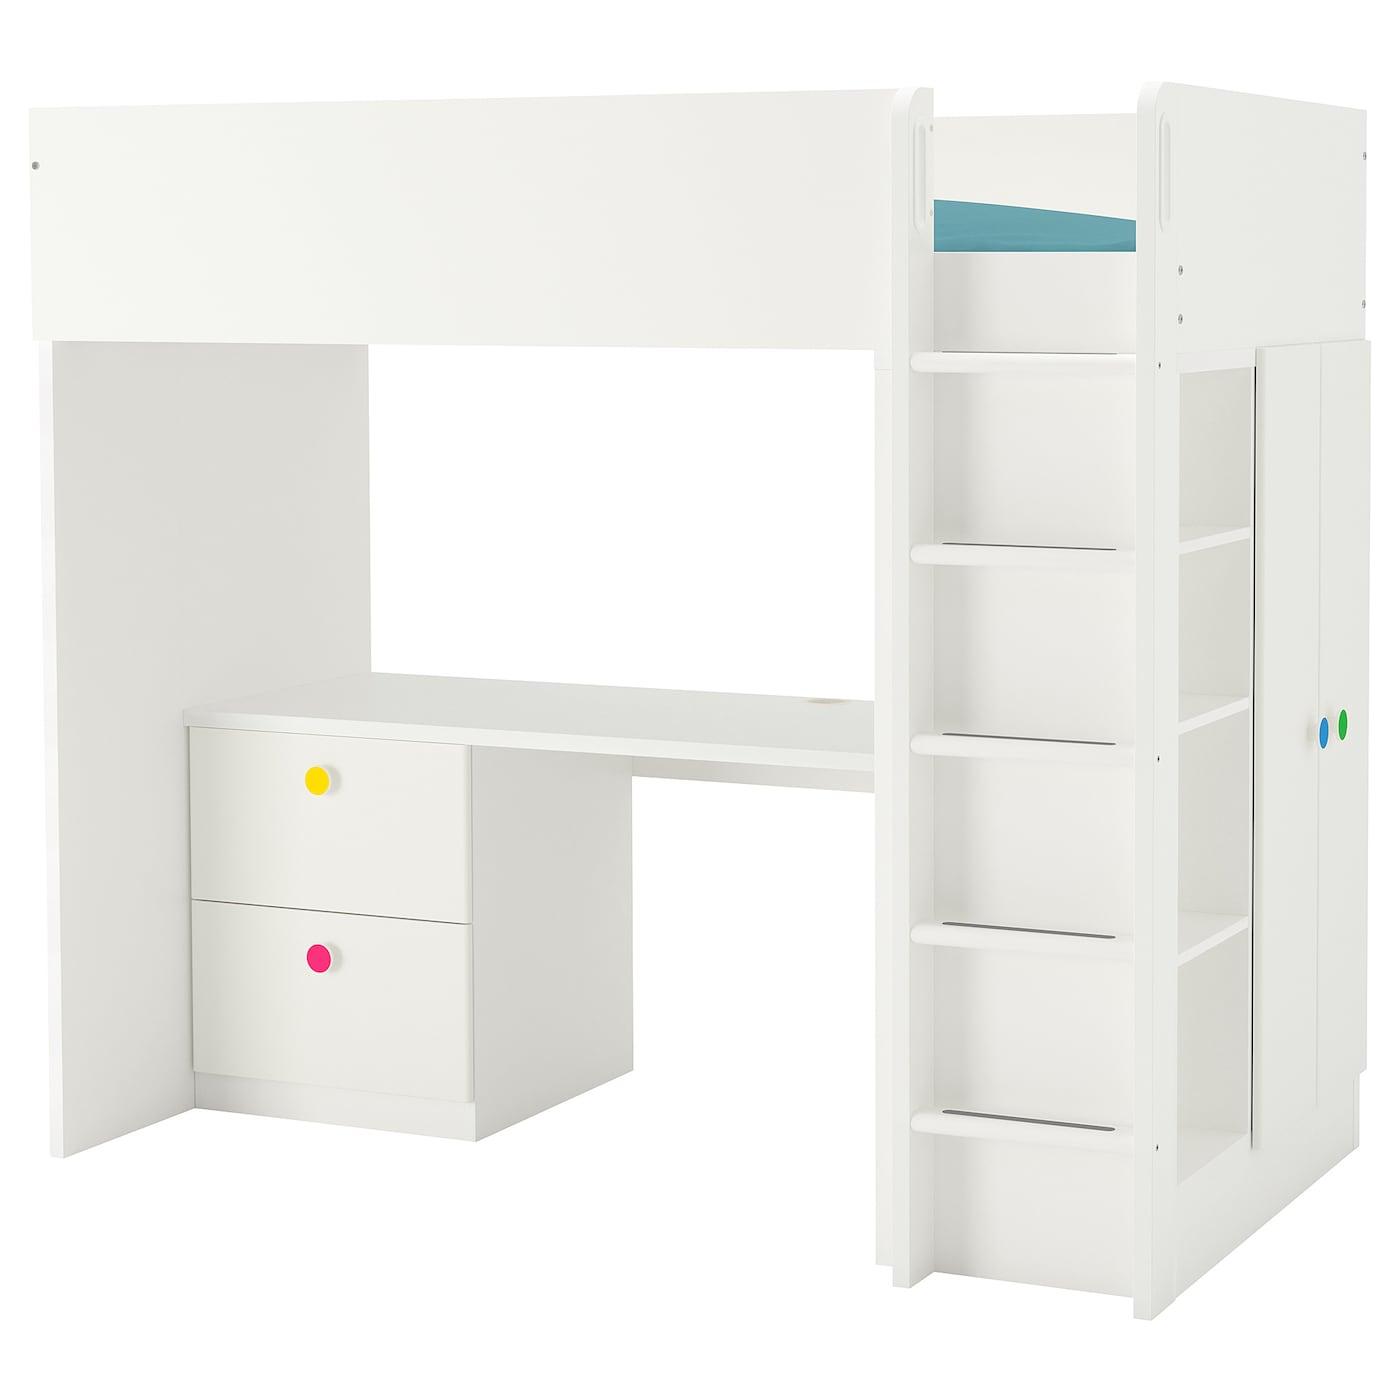 combinaisons stuva. Black Bedroom Furniture Sets. Home Design Ideas